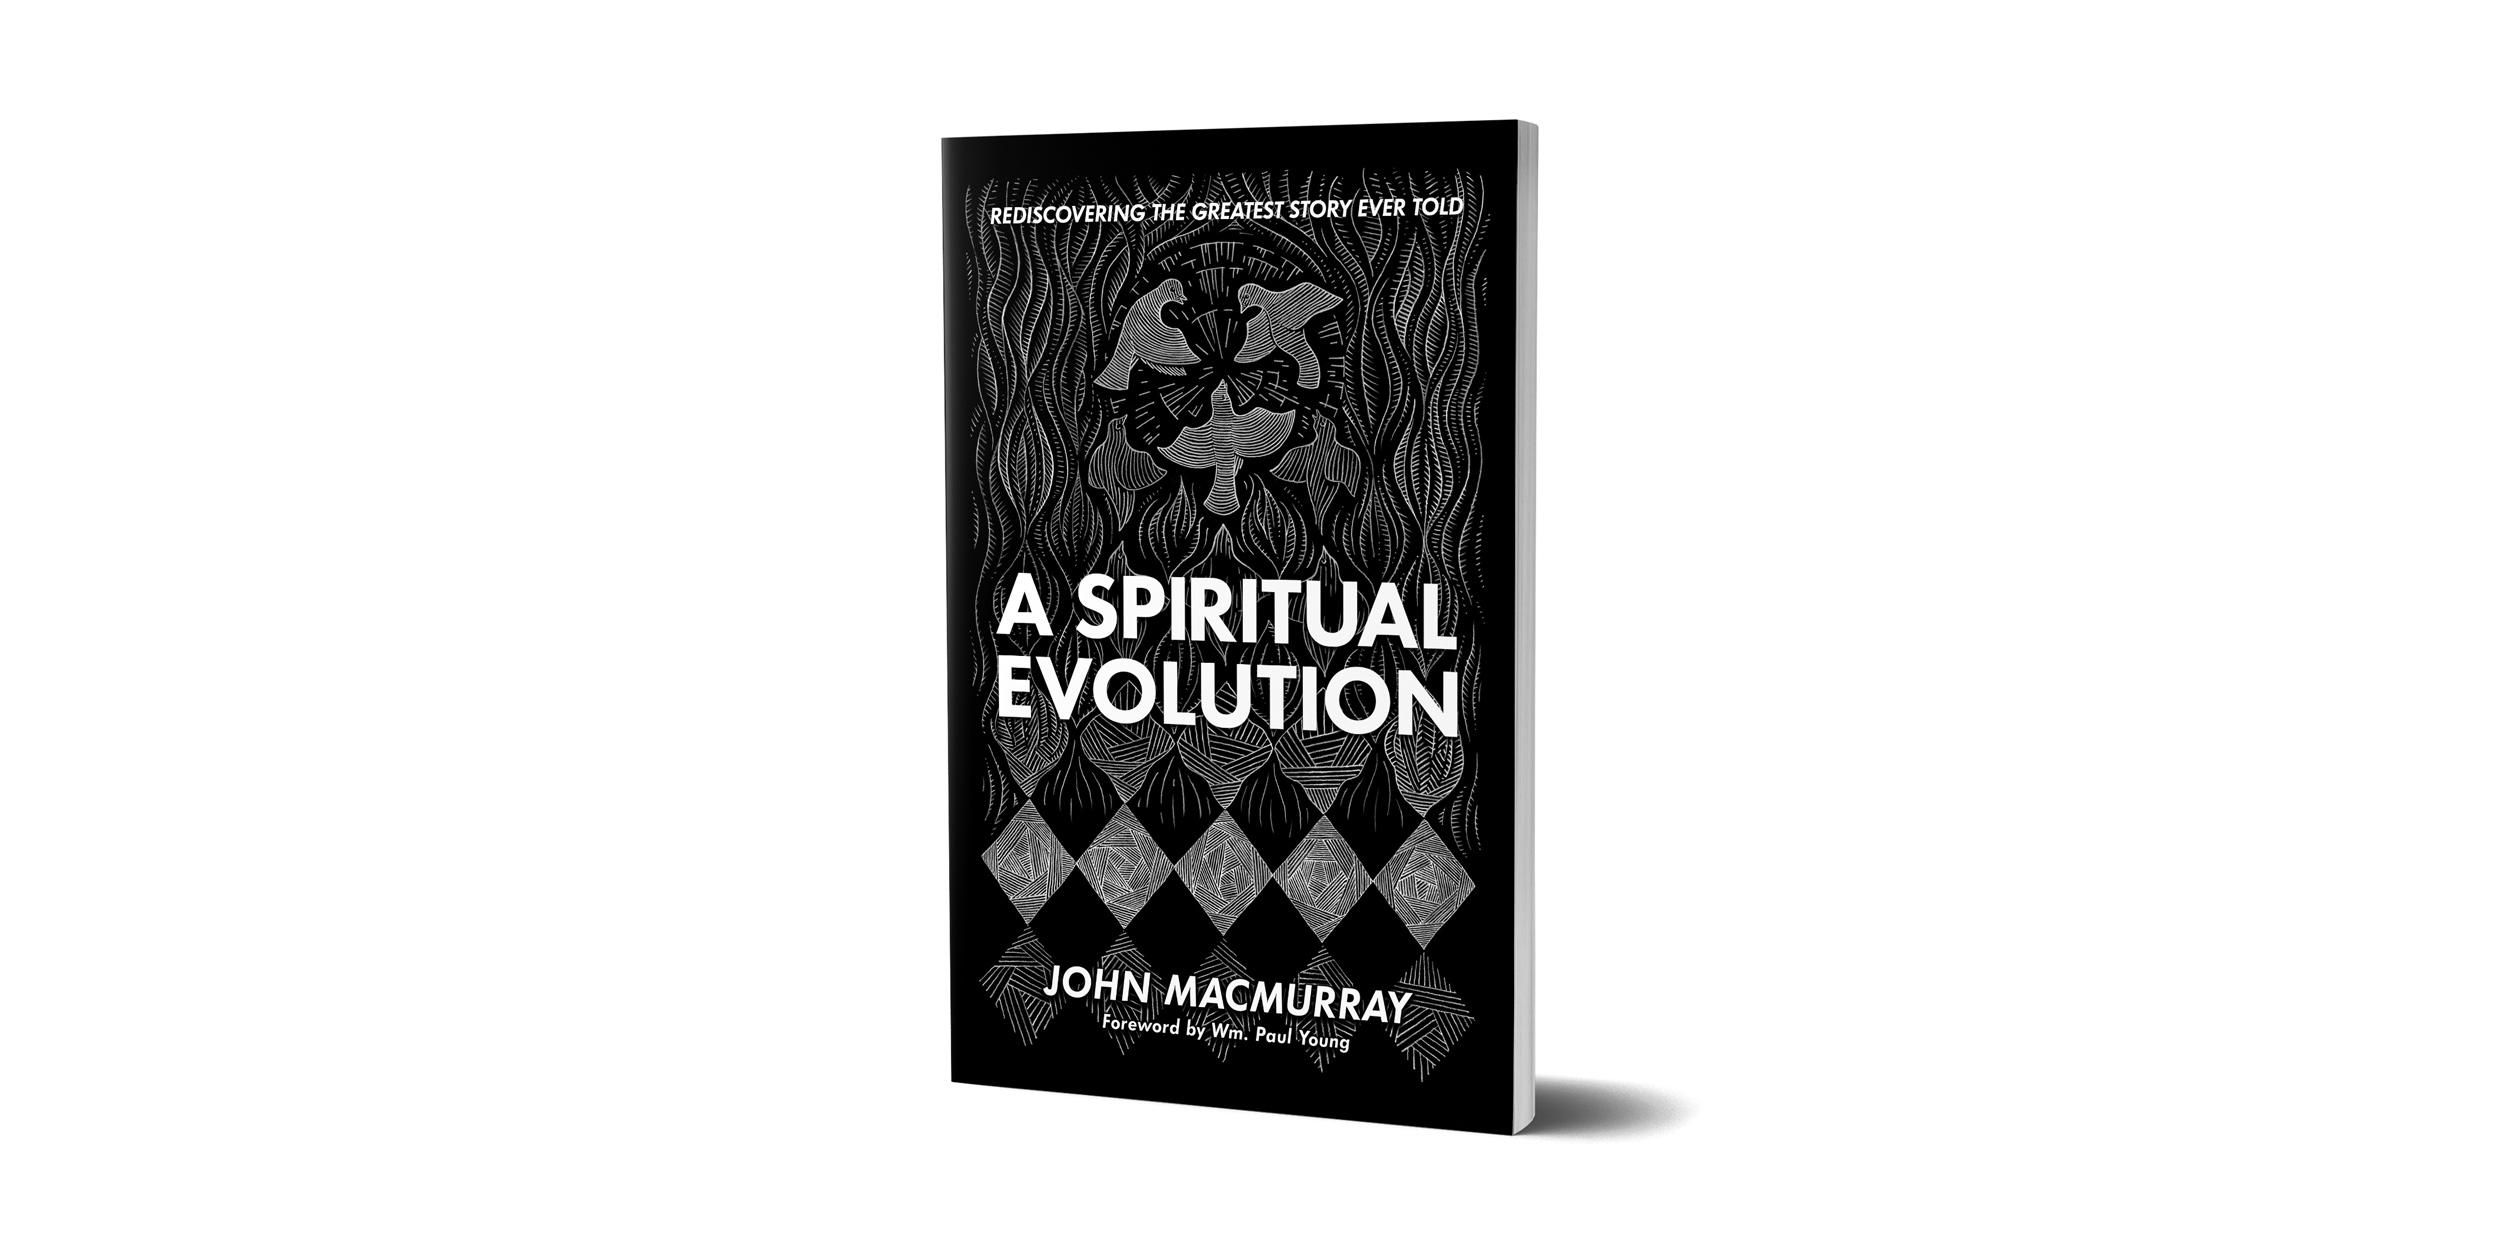 A_Spiritual_Evolution-white-wide.jpg